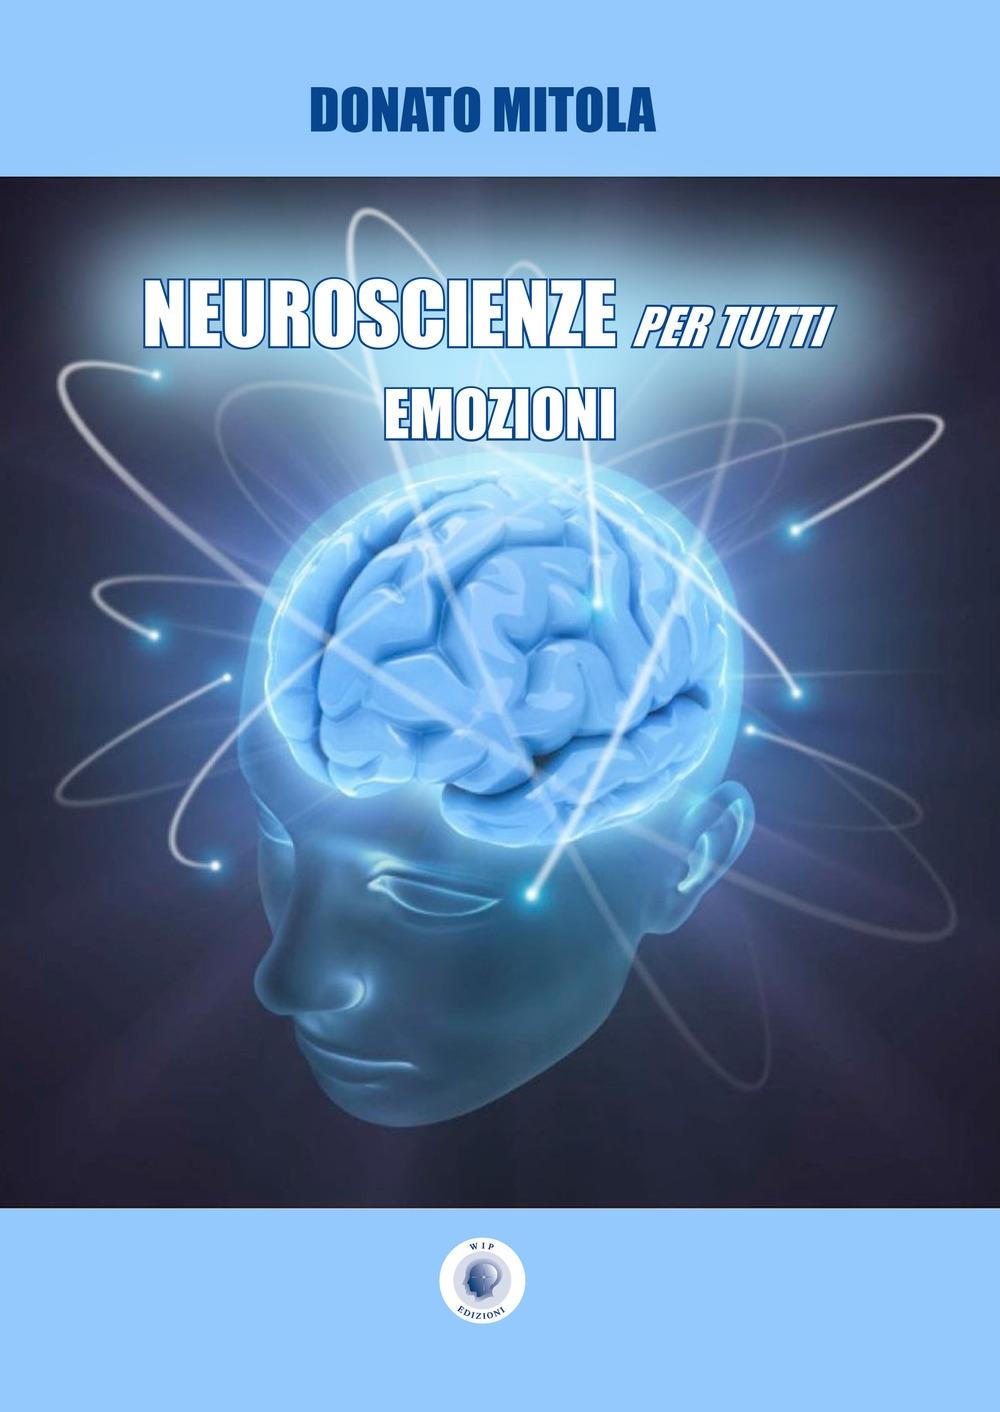 Neuroscienze per tutti emozioni